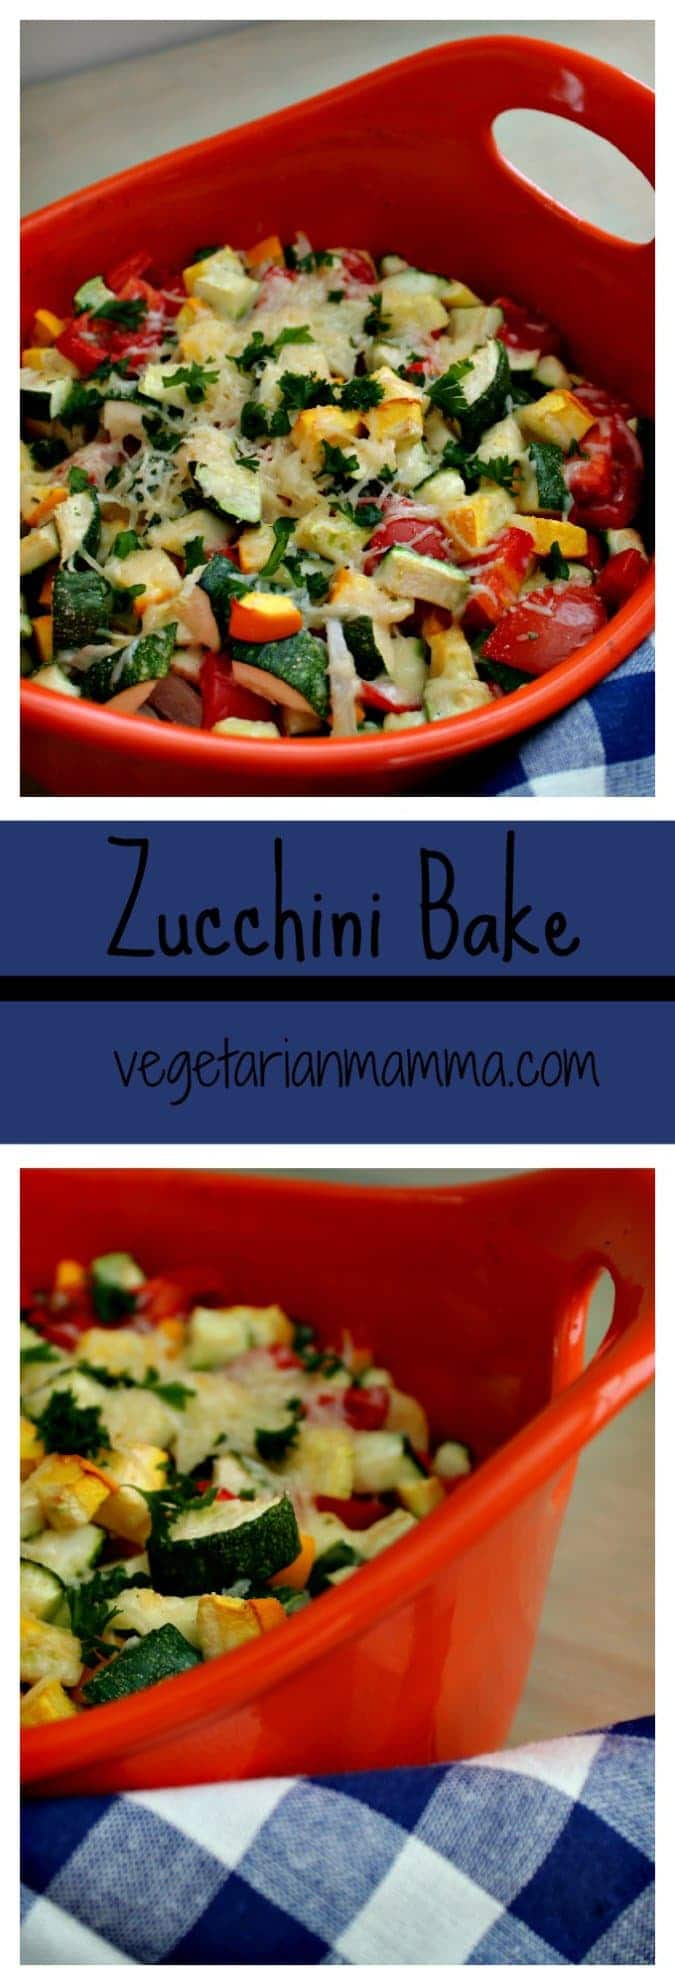 Zucchini Bake #Casserole #glutenfree @vegetarianmamma.com #Zucchini #SummerSquash #Tomato #Sidedish #vegetarian